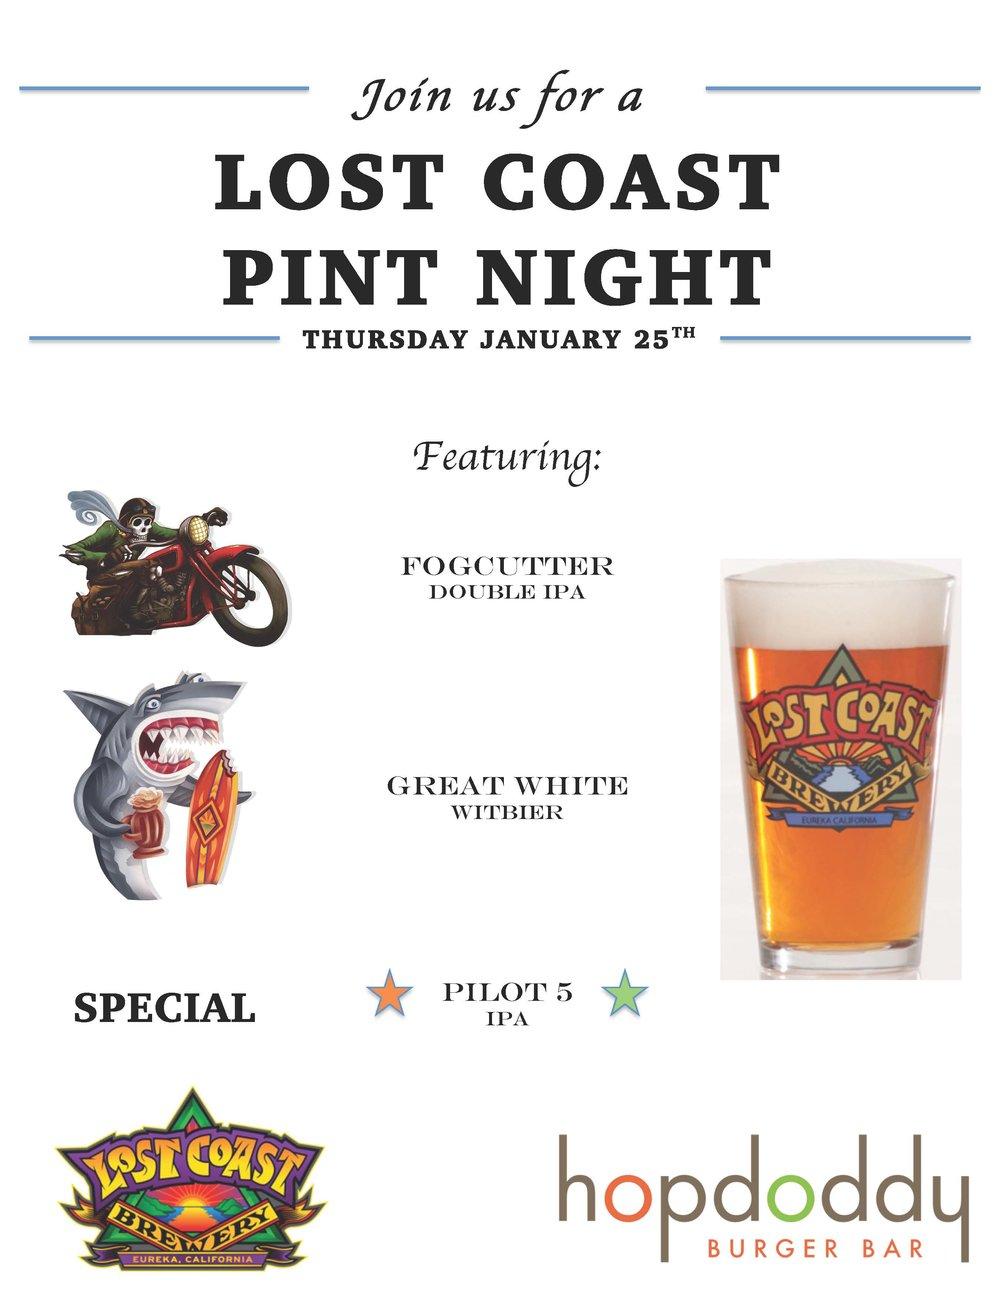 Lost Coast Pint Night Poster.jpg